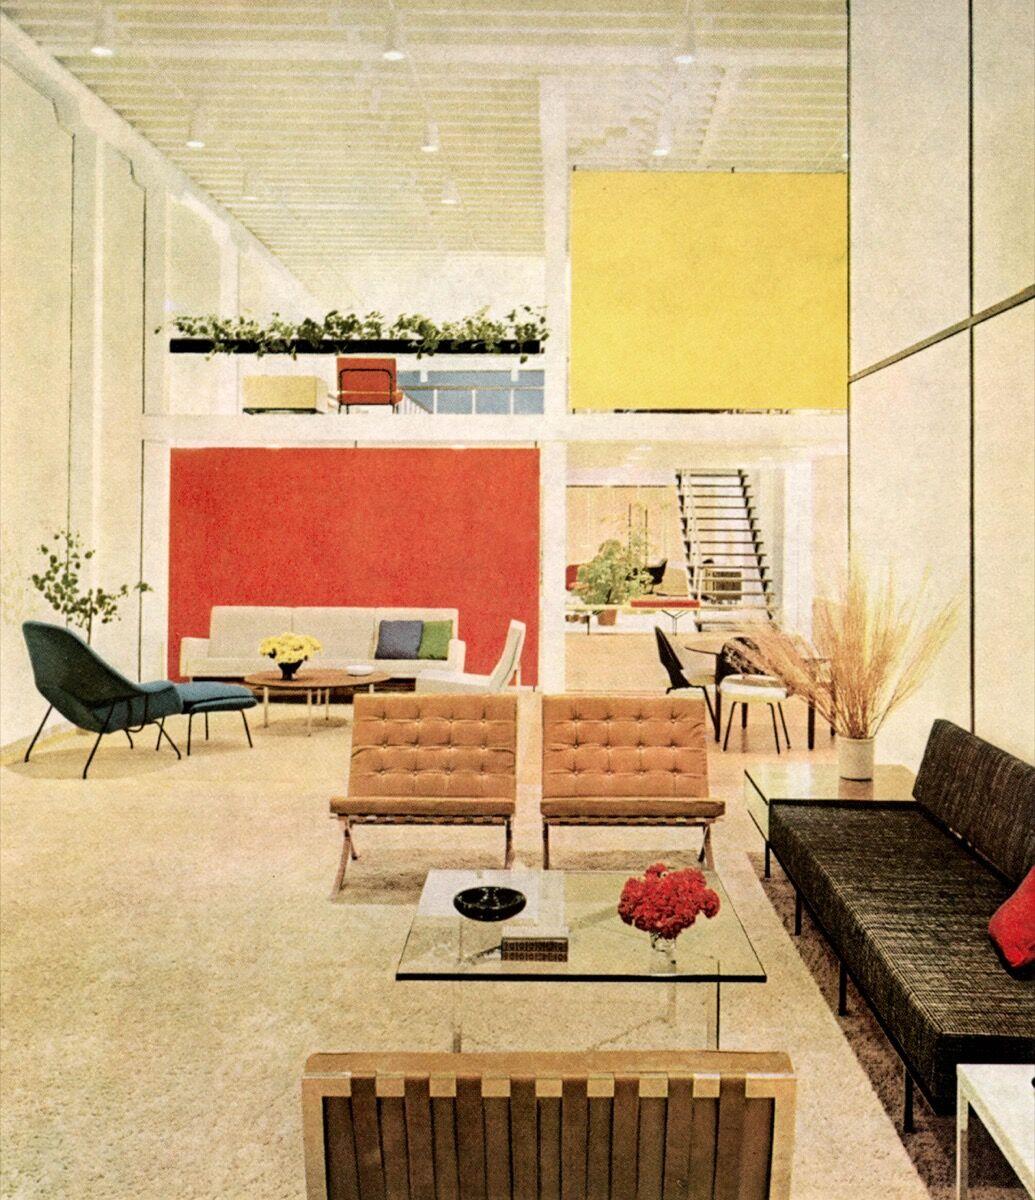 Knoll Showroom in San Francisco, California, 1954. Courtesy of Knoll, Inc.